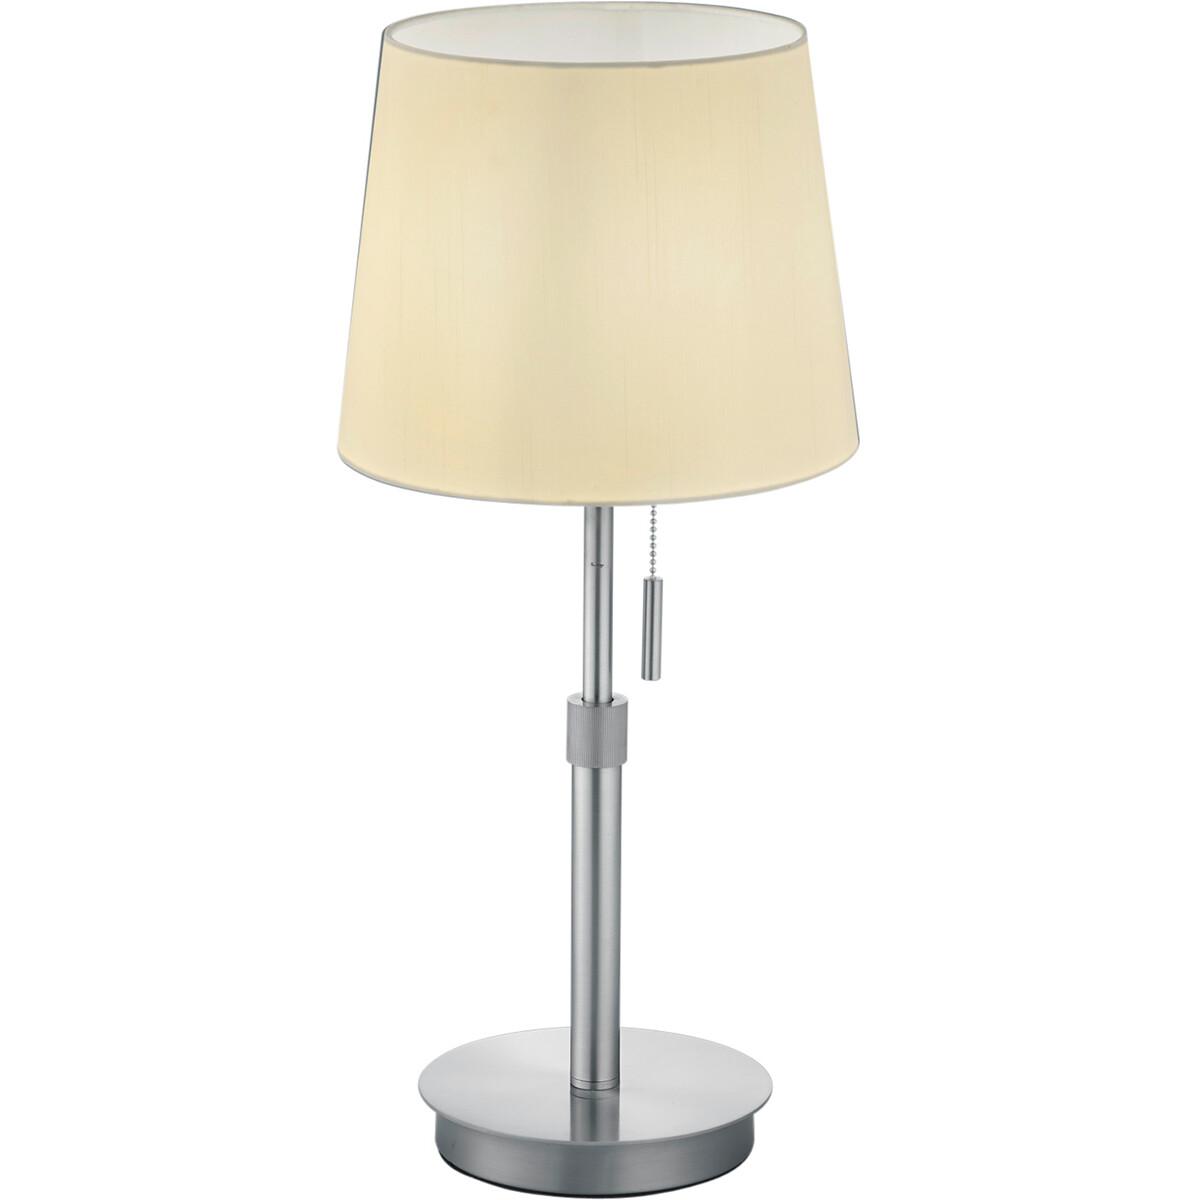 LED Tafellamp - Tafelverlichting - Trion Dyon - E27 Fitting - Rond - Mat Nikkel - Aluminium